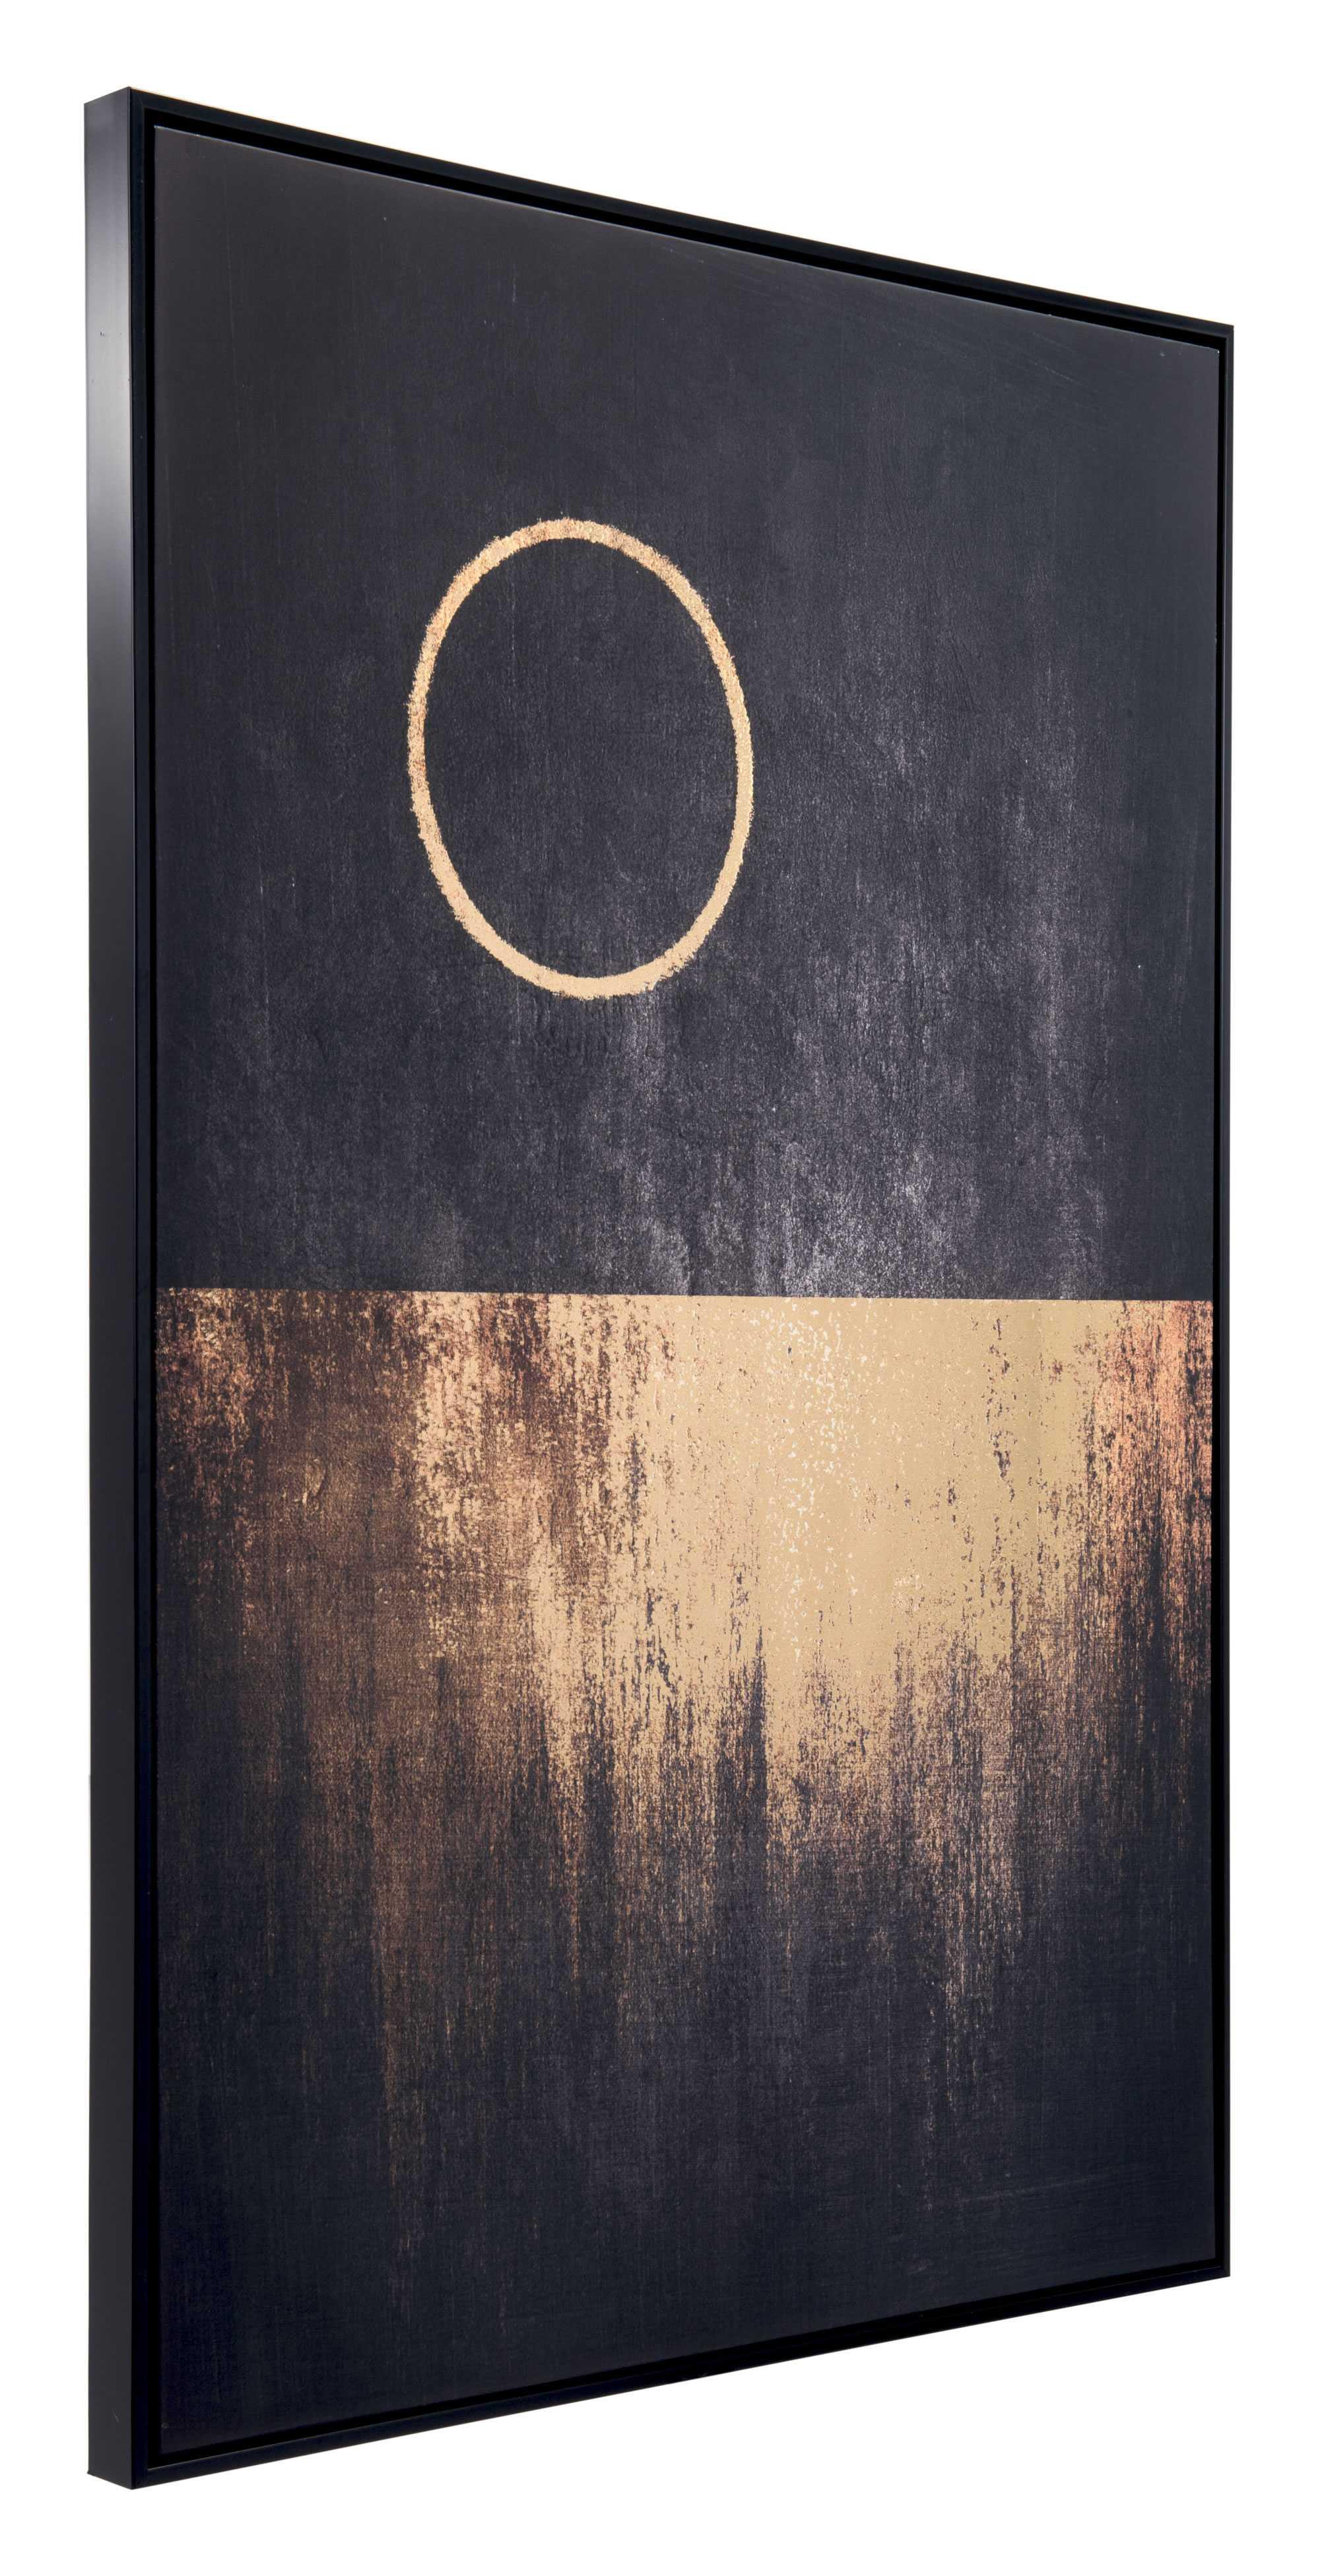 "32.7"" x 1.7"" x 48.4"" Black & Gold, Pine Wood, Moon Rises Canvas"